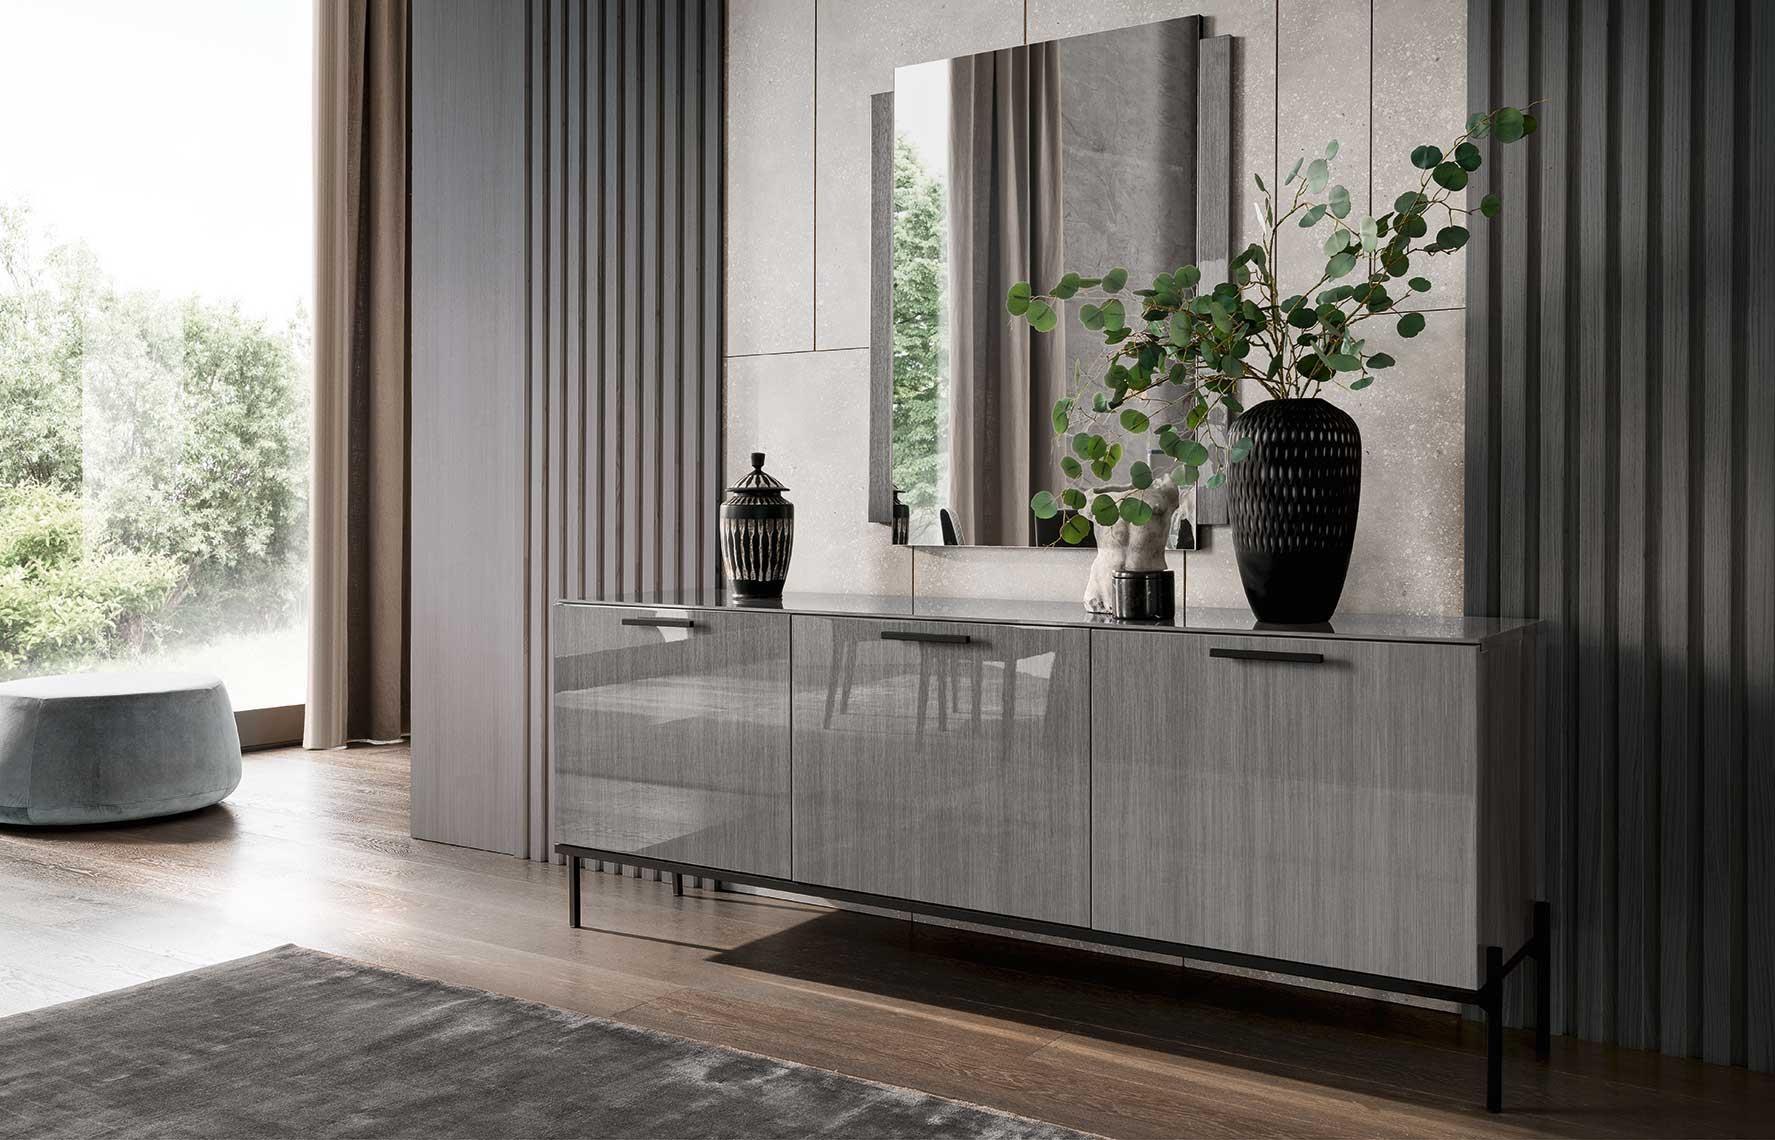 Novecento Buffet by Alf Italia at HomeWorld Furniture